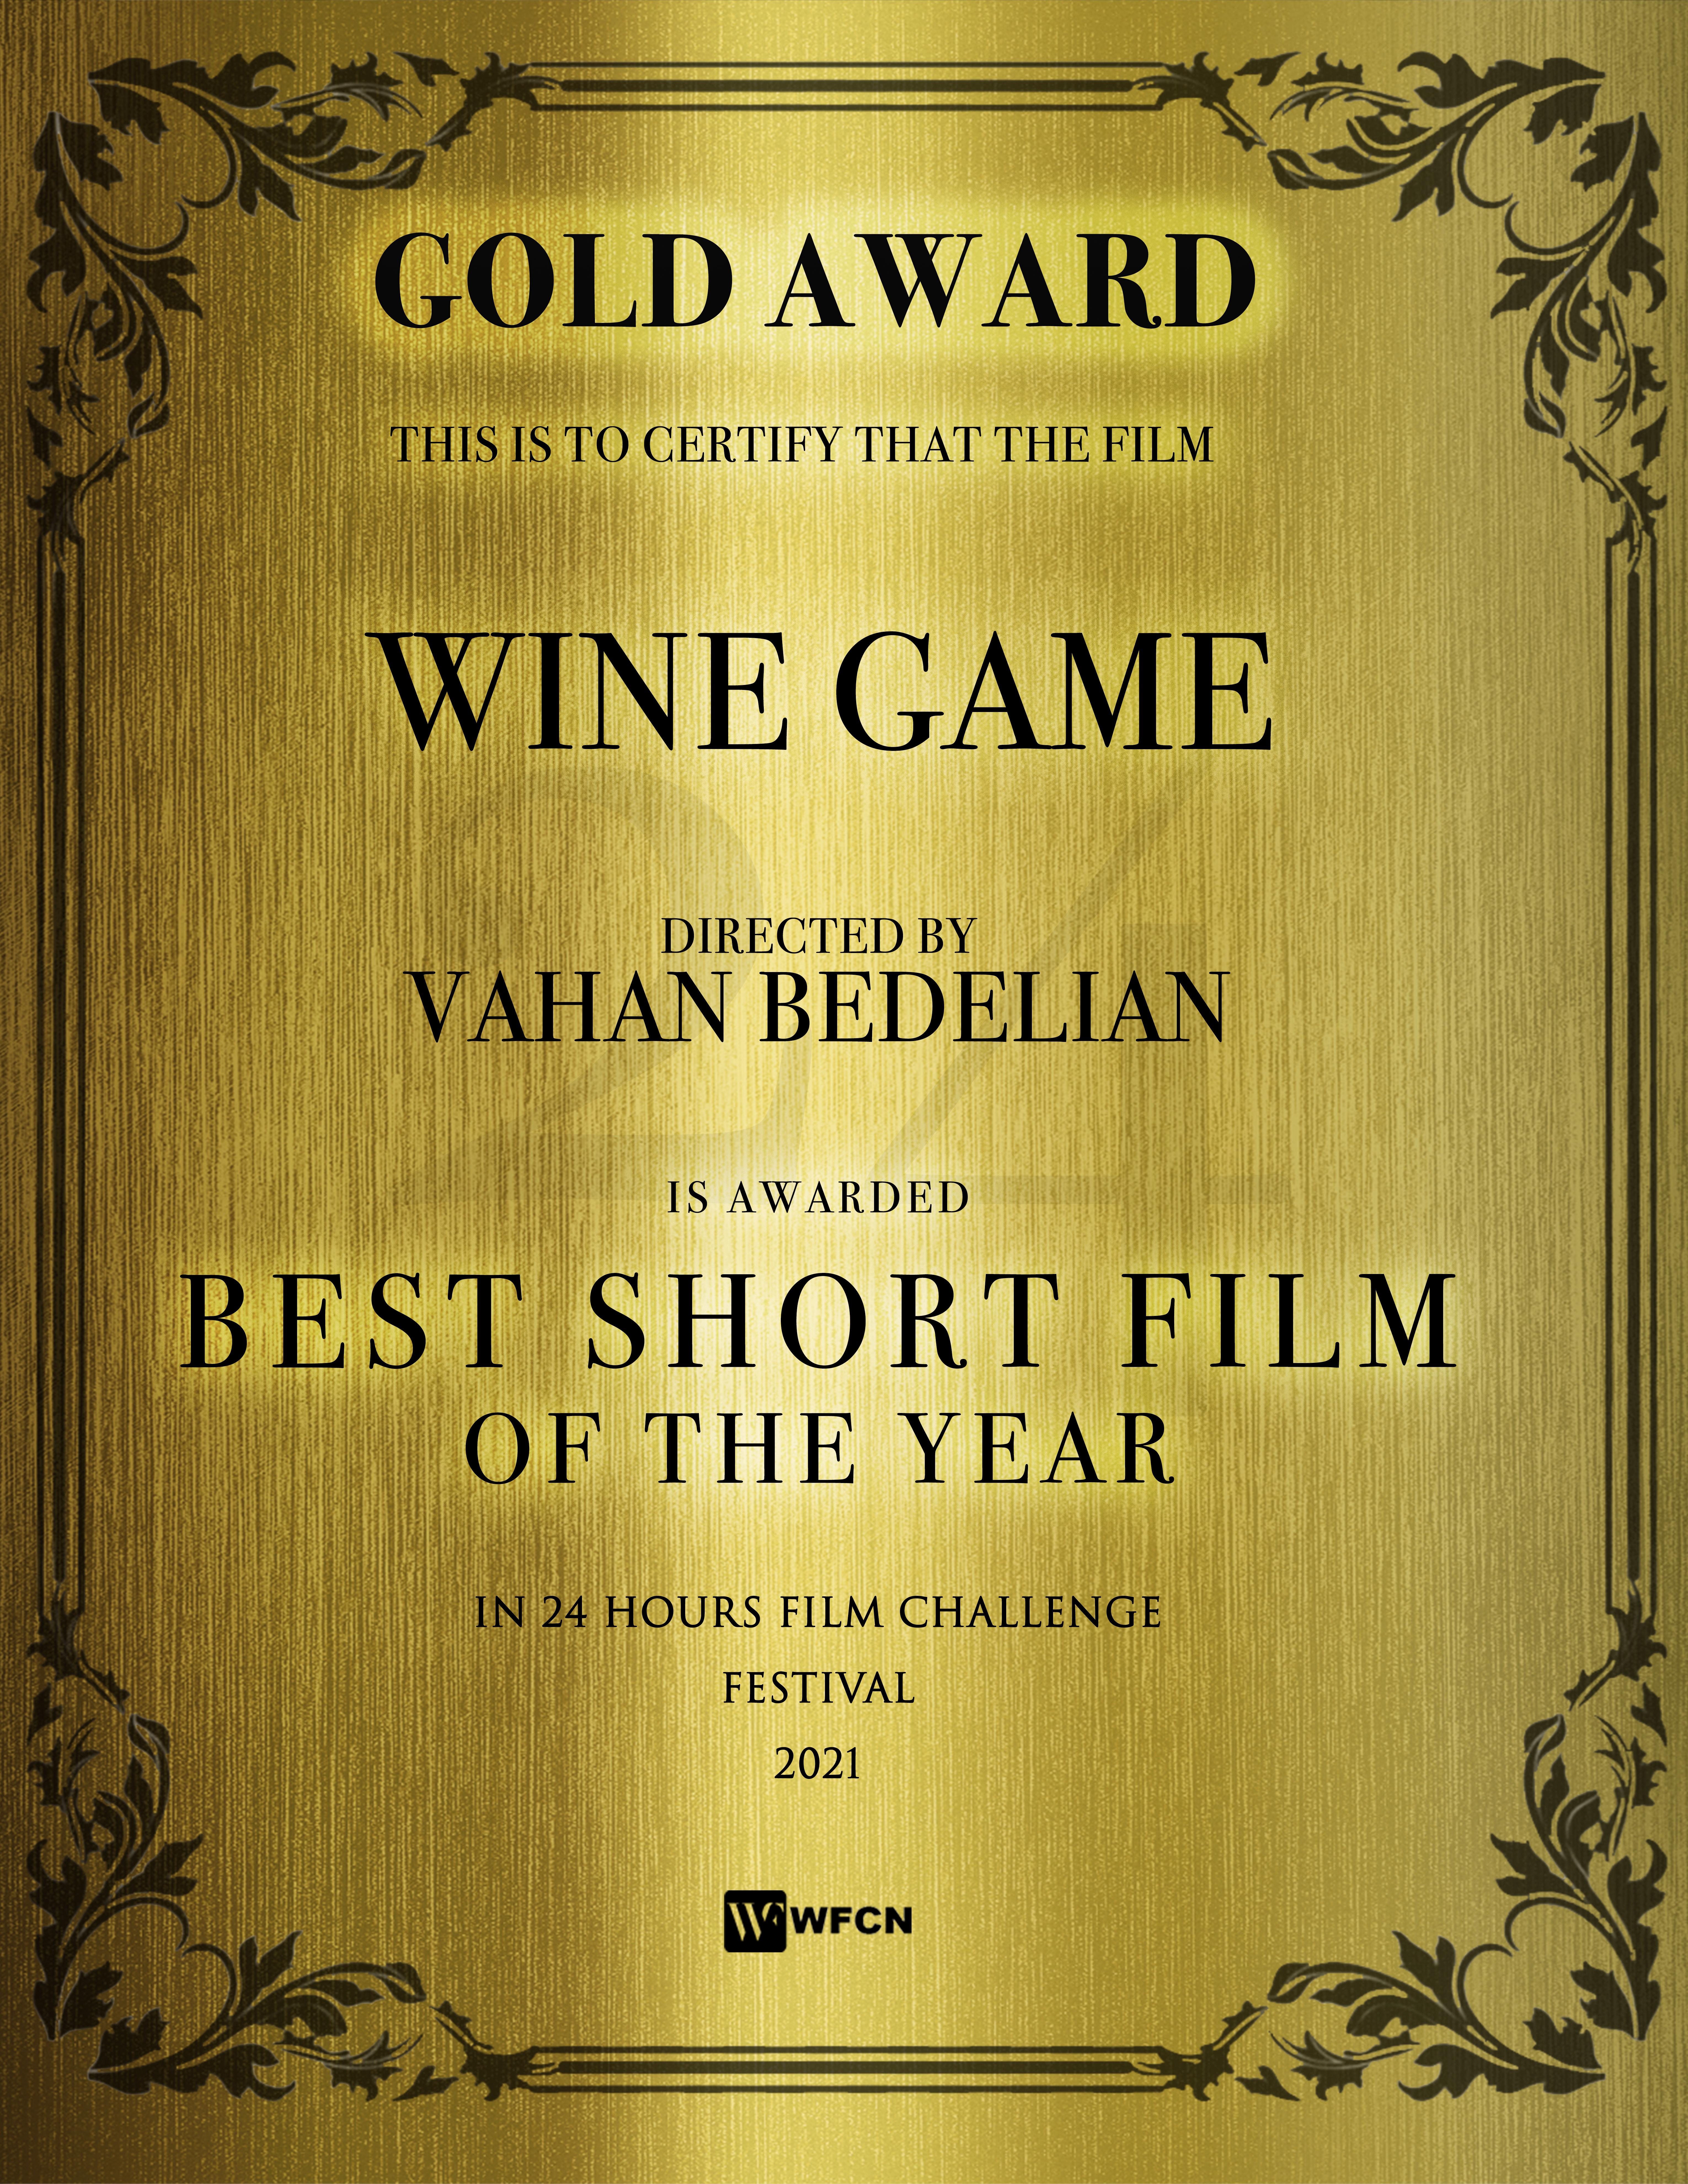 24 Hours Film Challenge GOLD AWARD